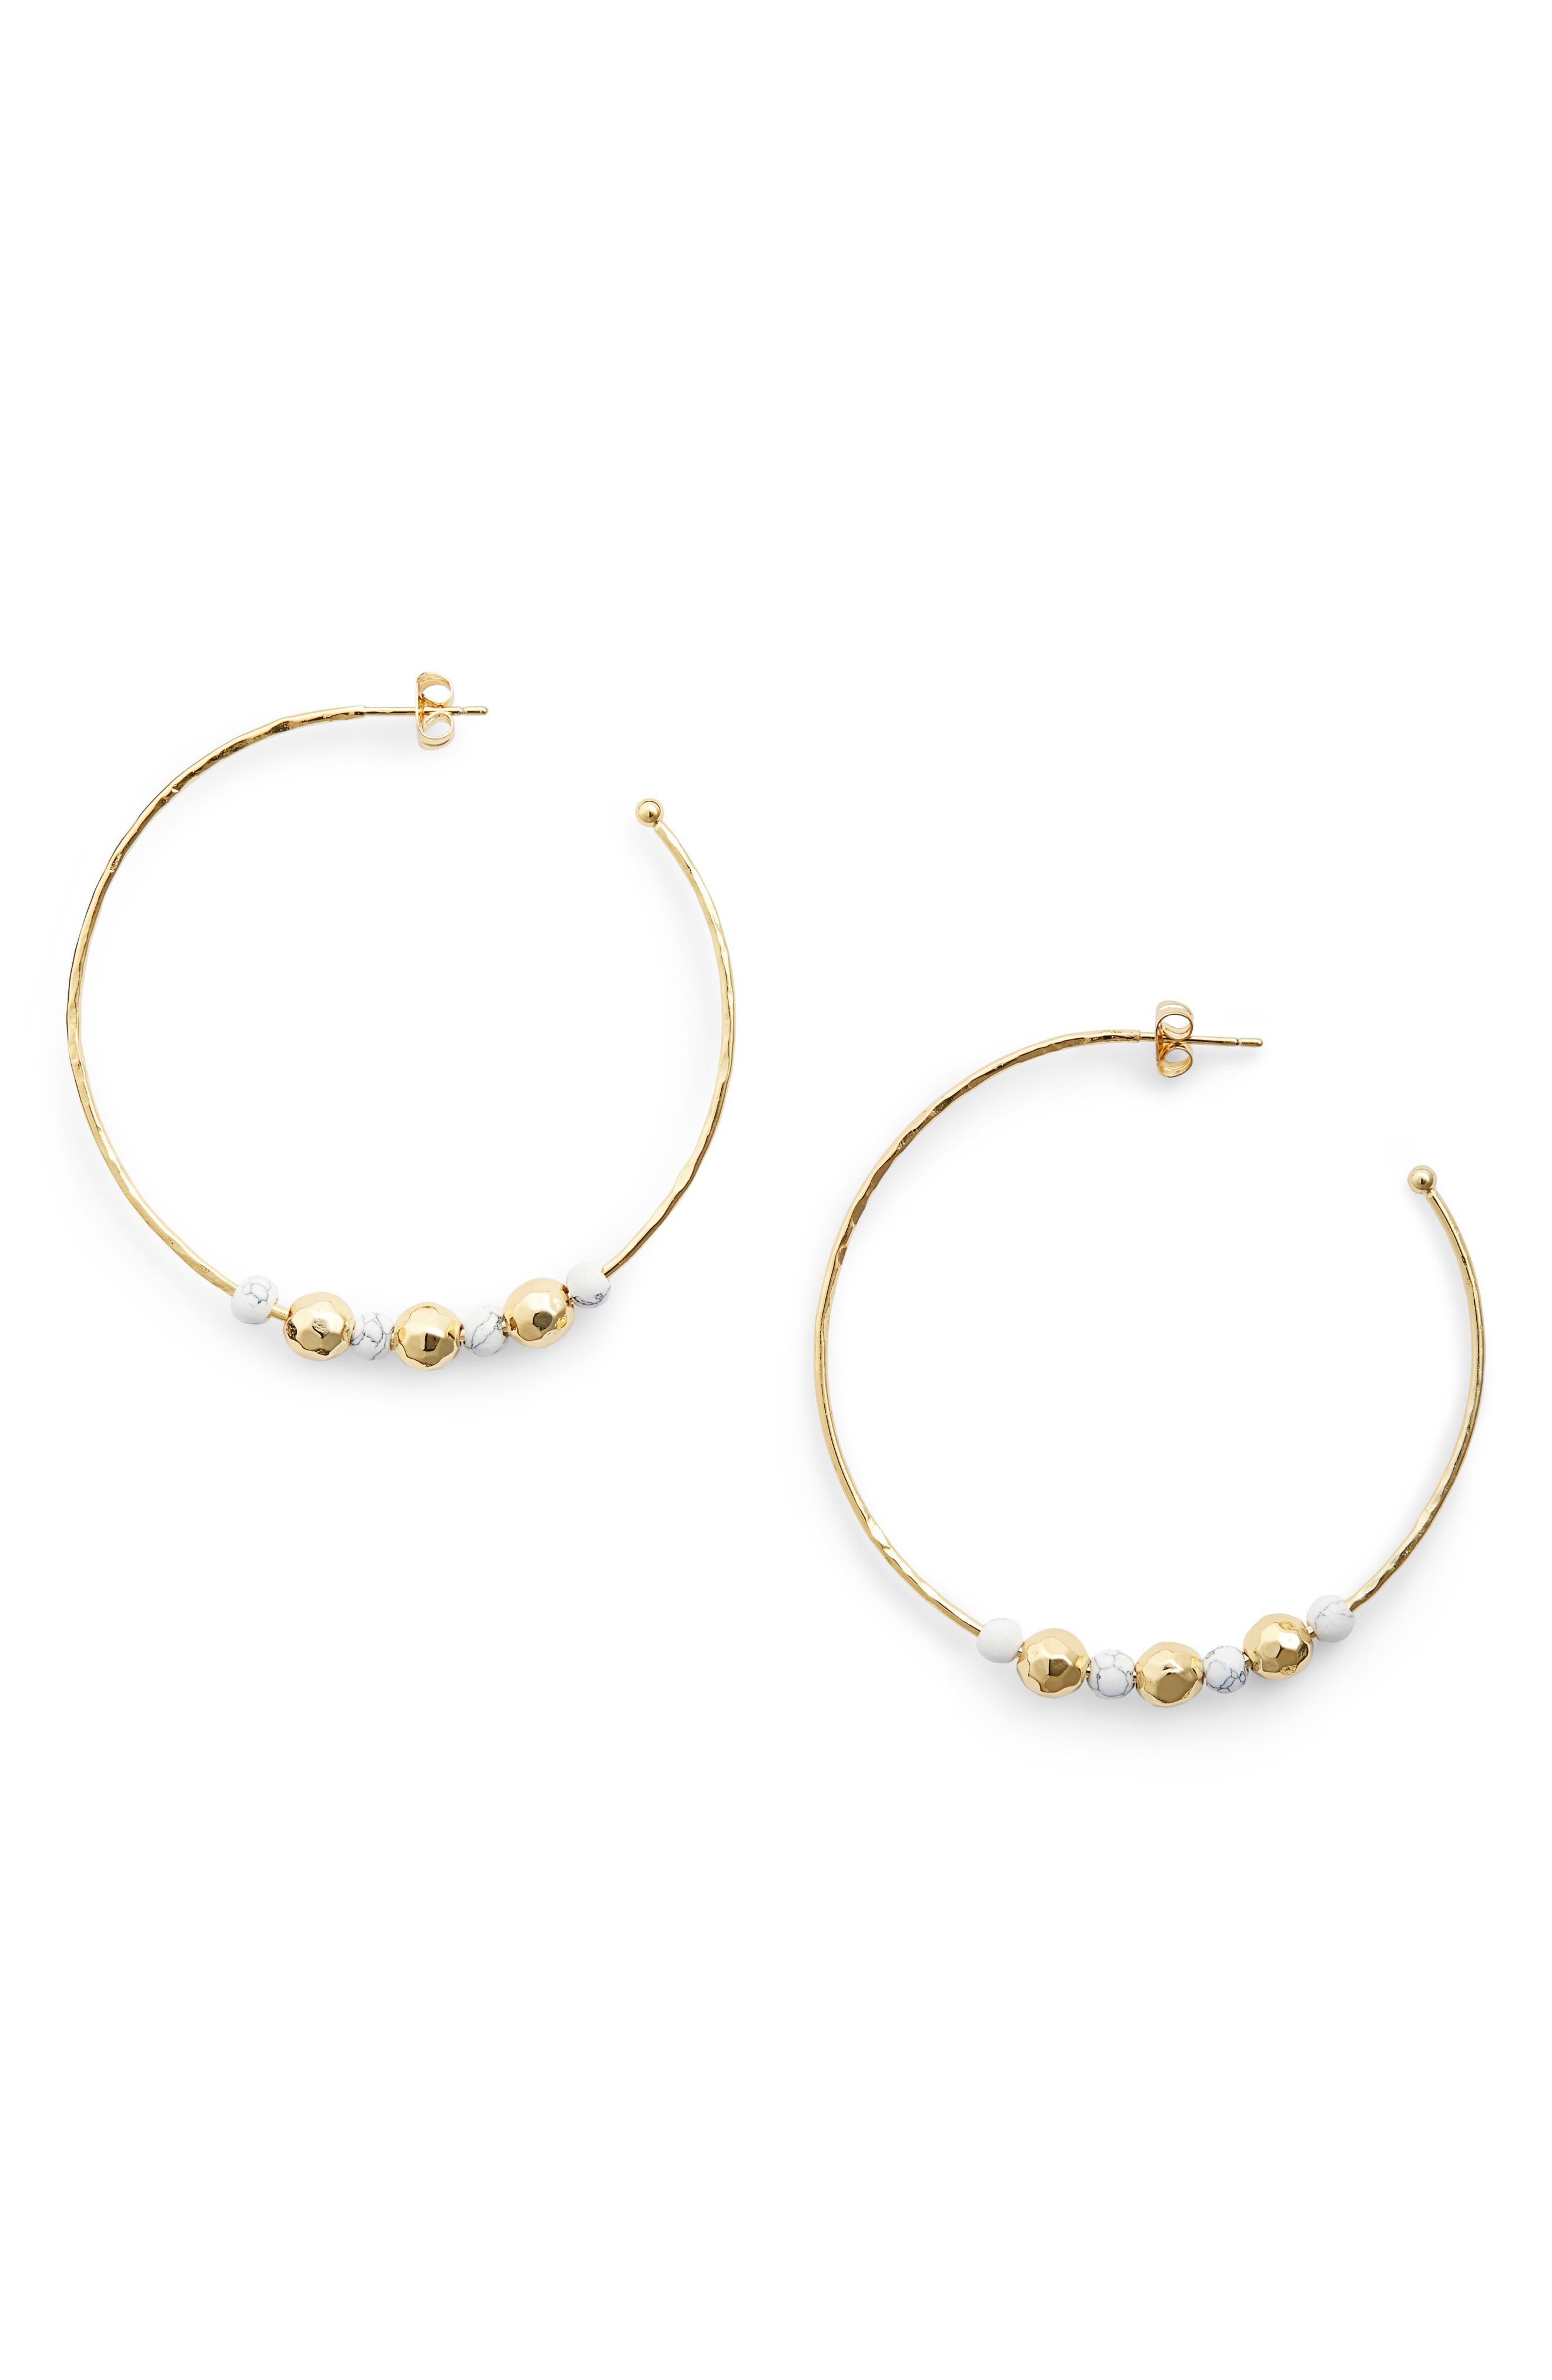 Gorjana Gypset Hoop Earrings In Howlite/ Gold